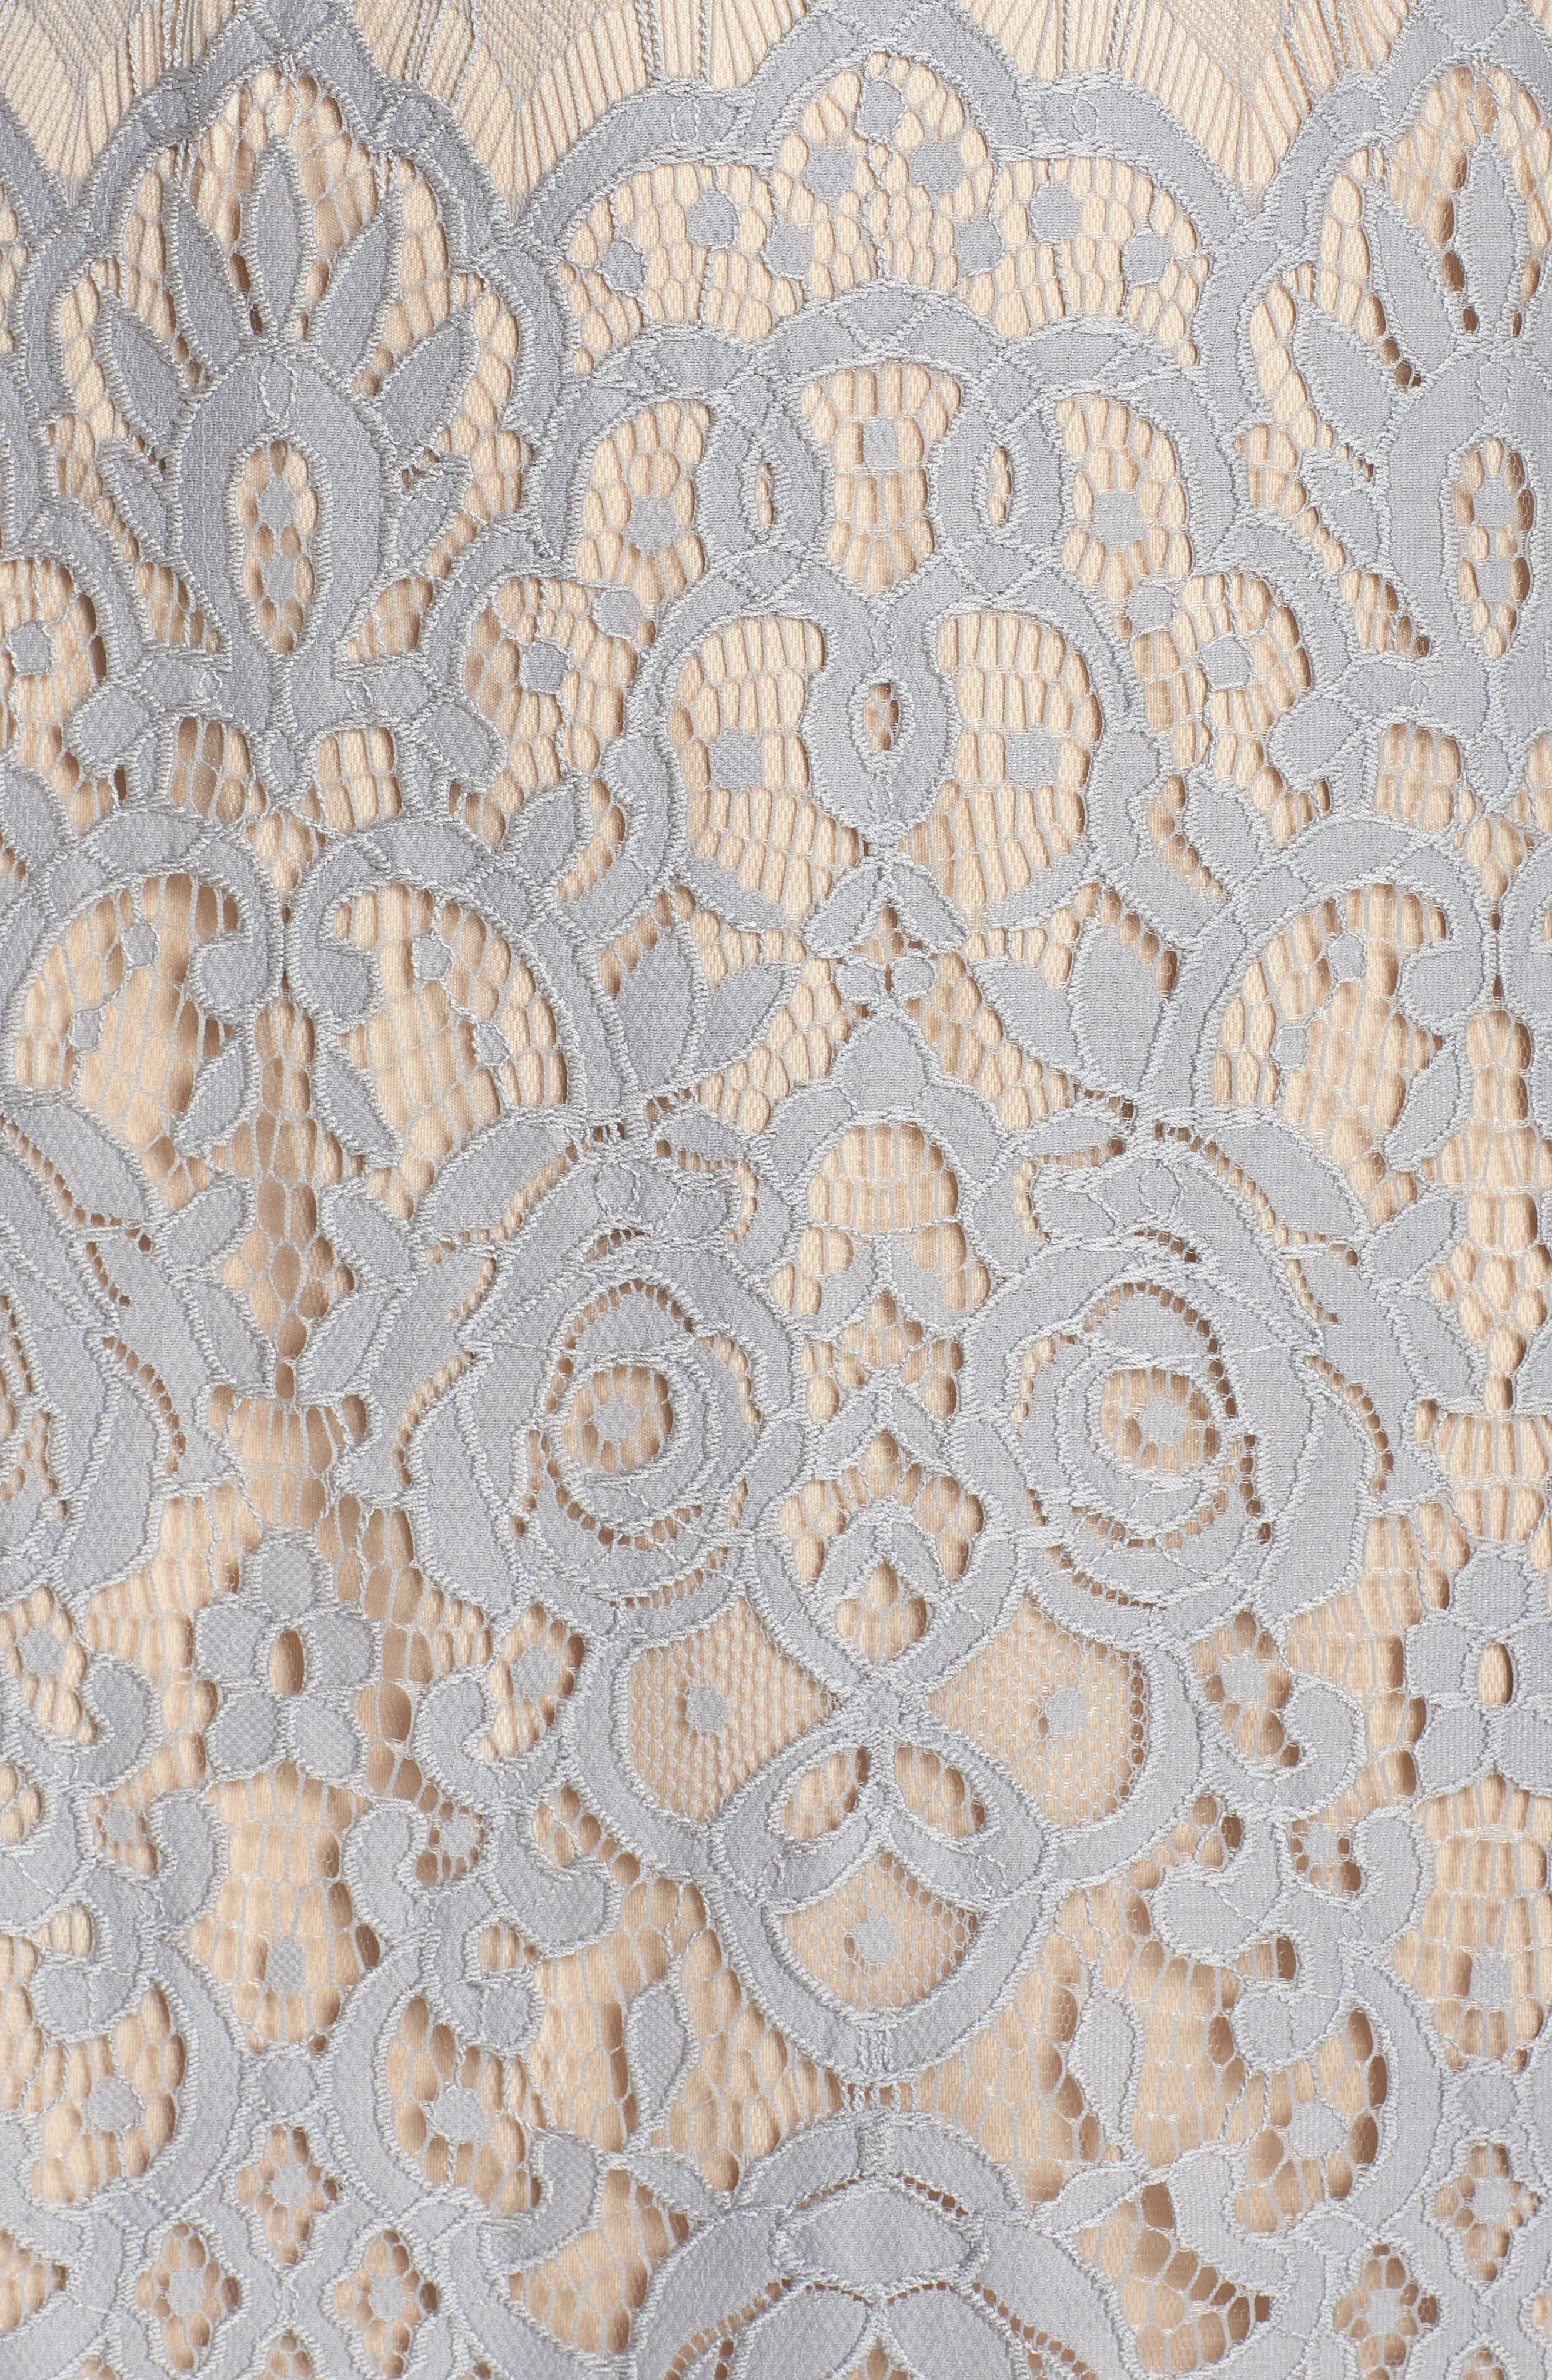 Lace Sheath Dress,                             Alternate thumbnail 5, color,                             060